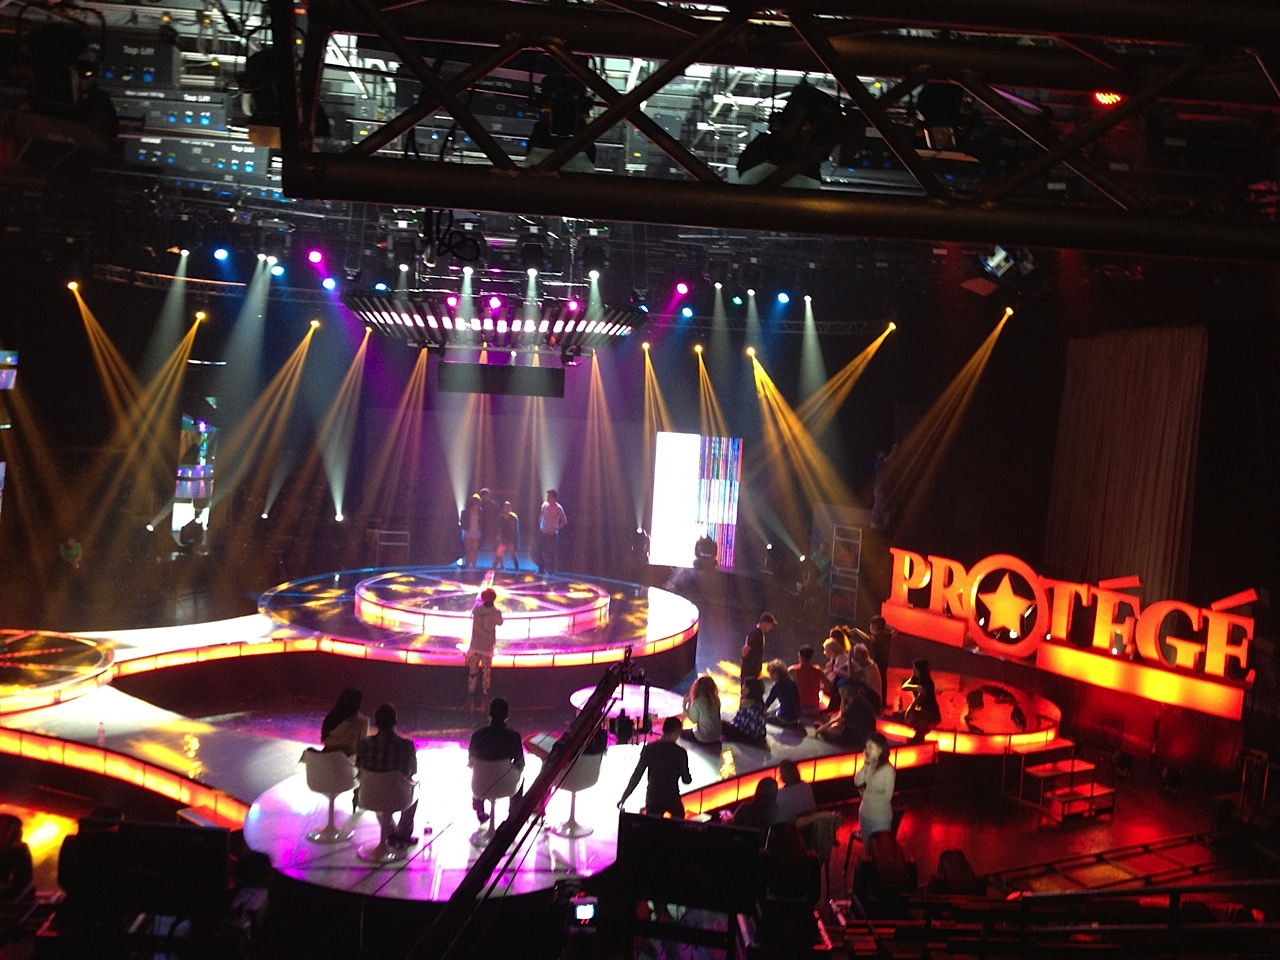 Protege ( GMA 7 )